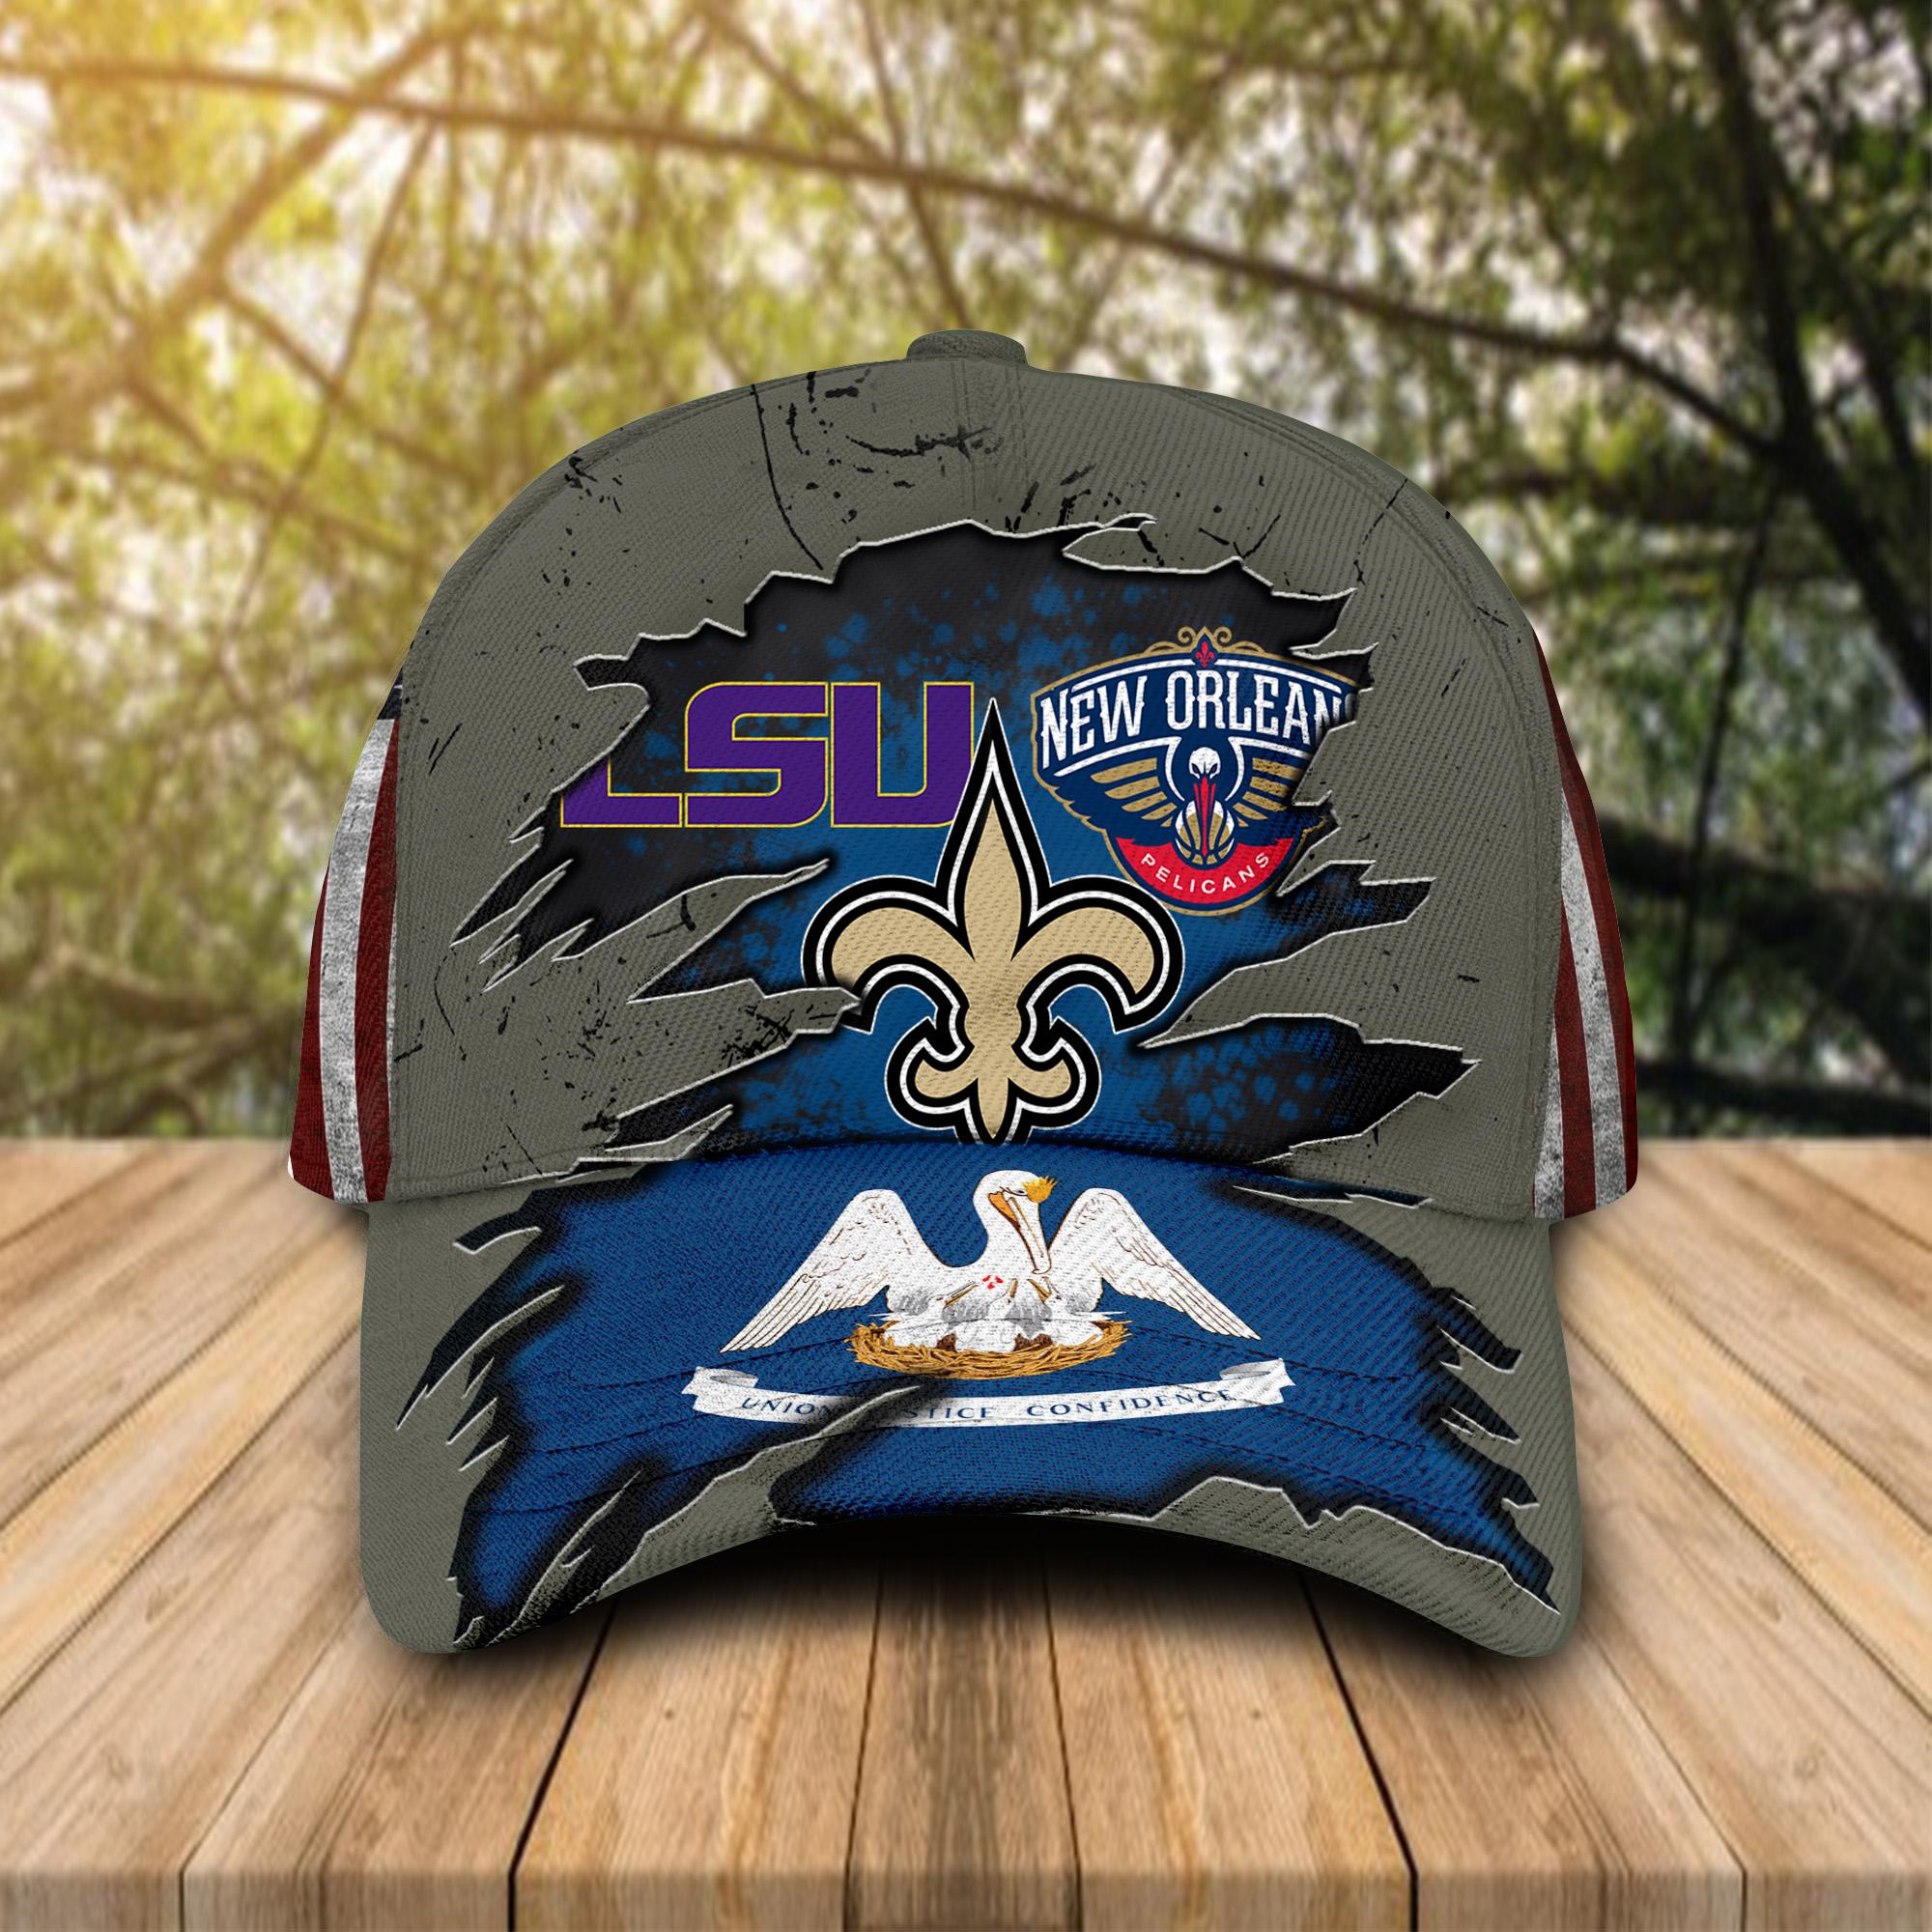 New Orleans Saints, New Orleans Pelicans, LSU Tigers Sports Teams Cap